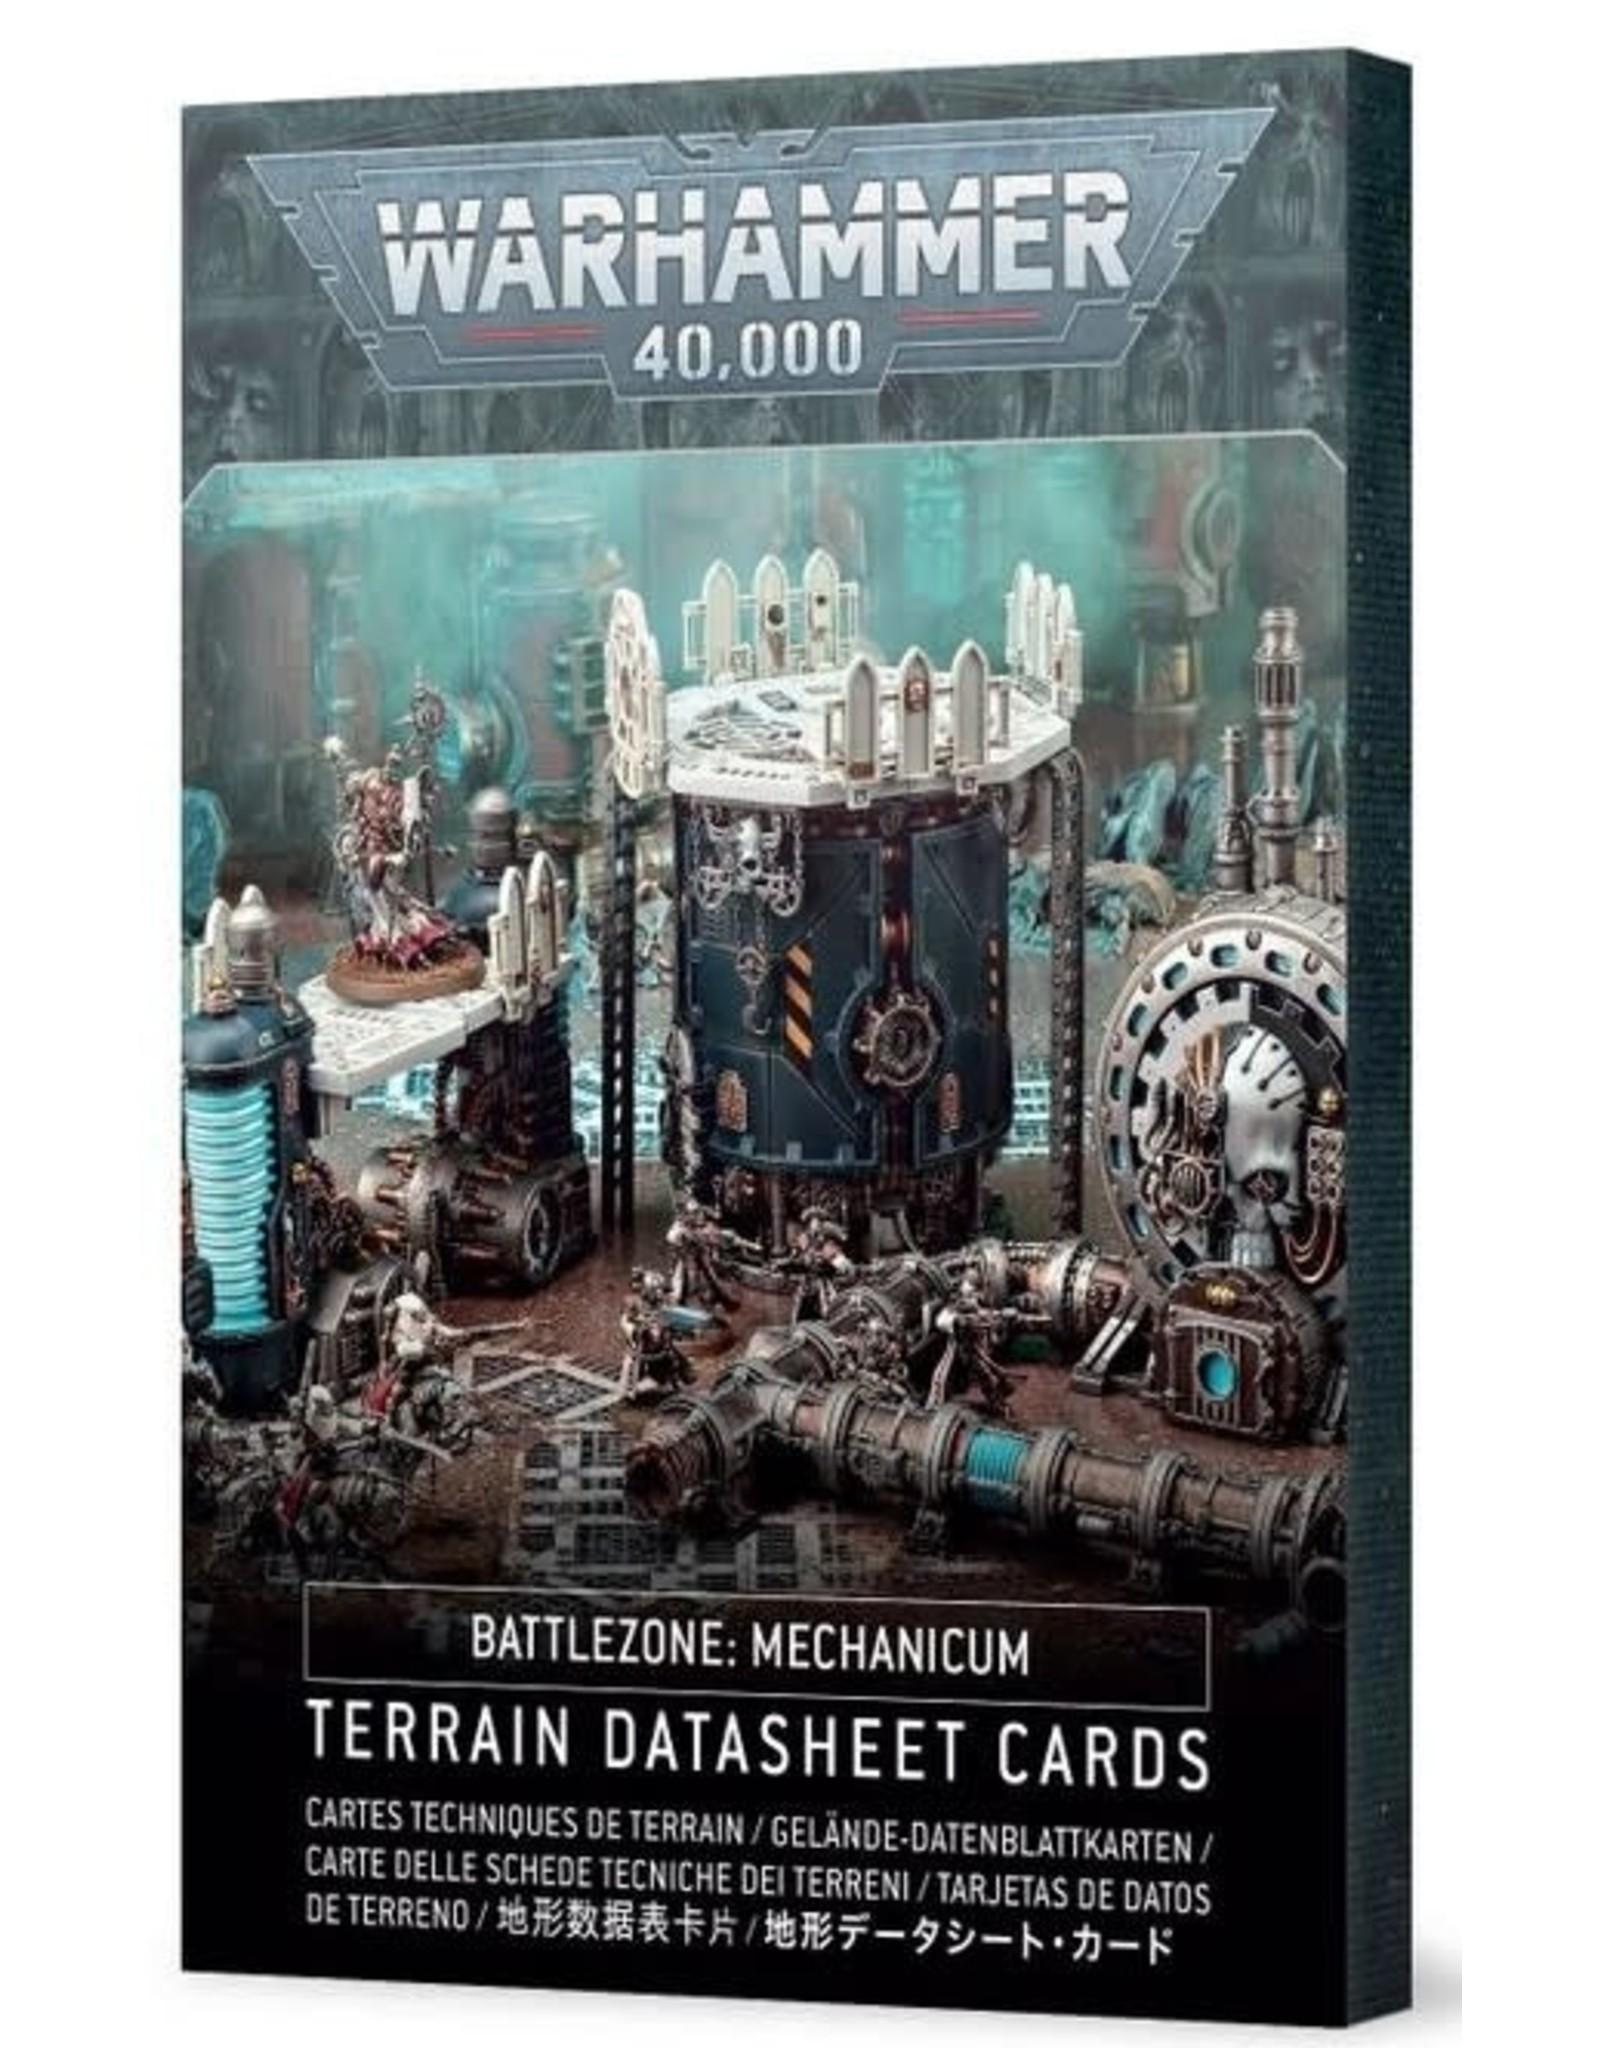 Games Workshop WH40K: Battlezone Mechanicum – Terrain Datasheet Cards